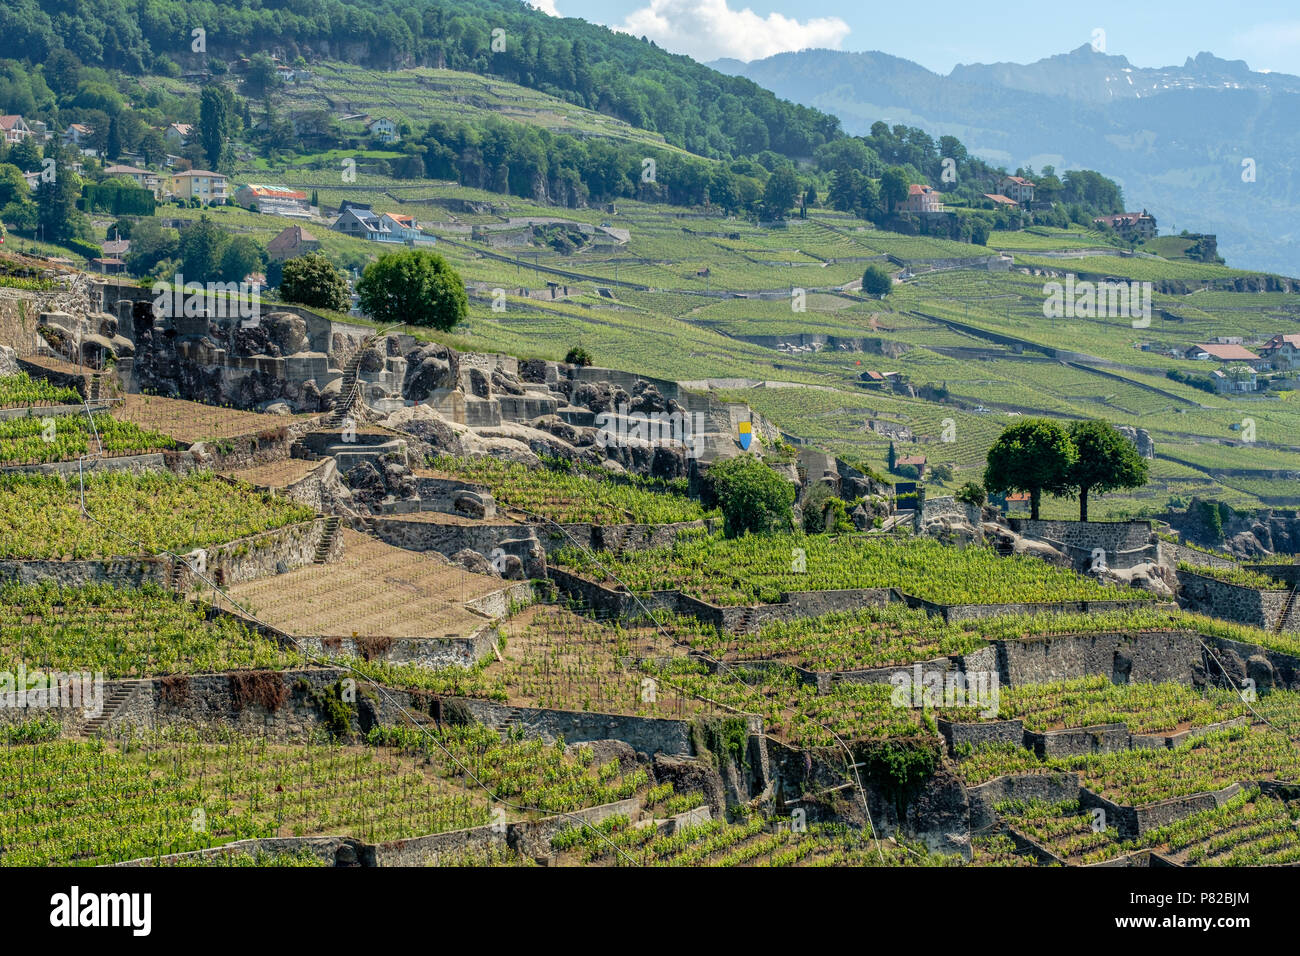 Vineyard terrasses of Lavaux, Switzerland - Stock Image